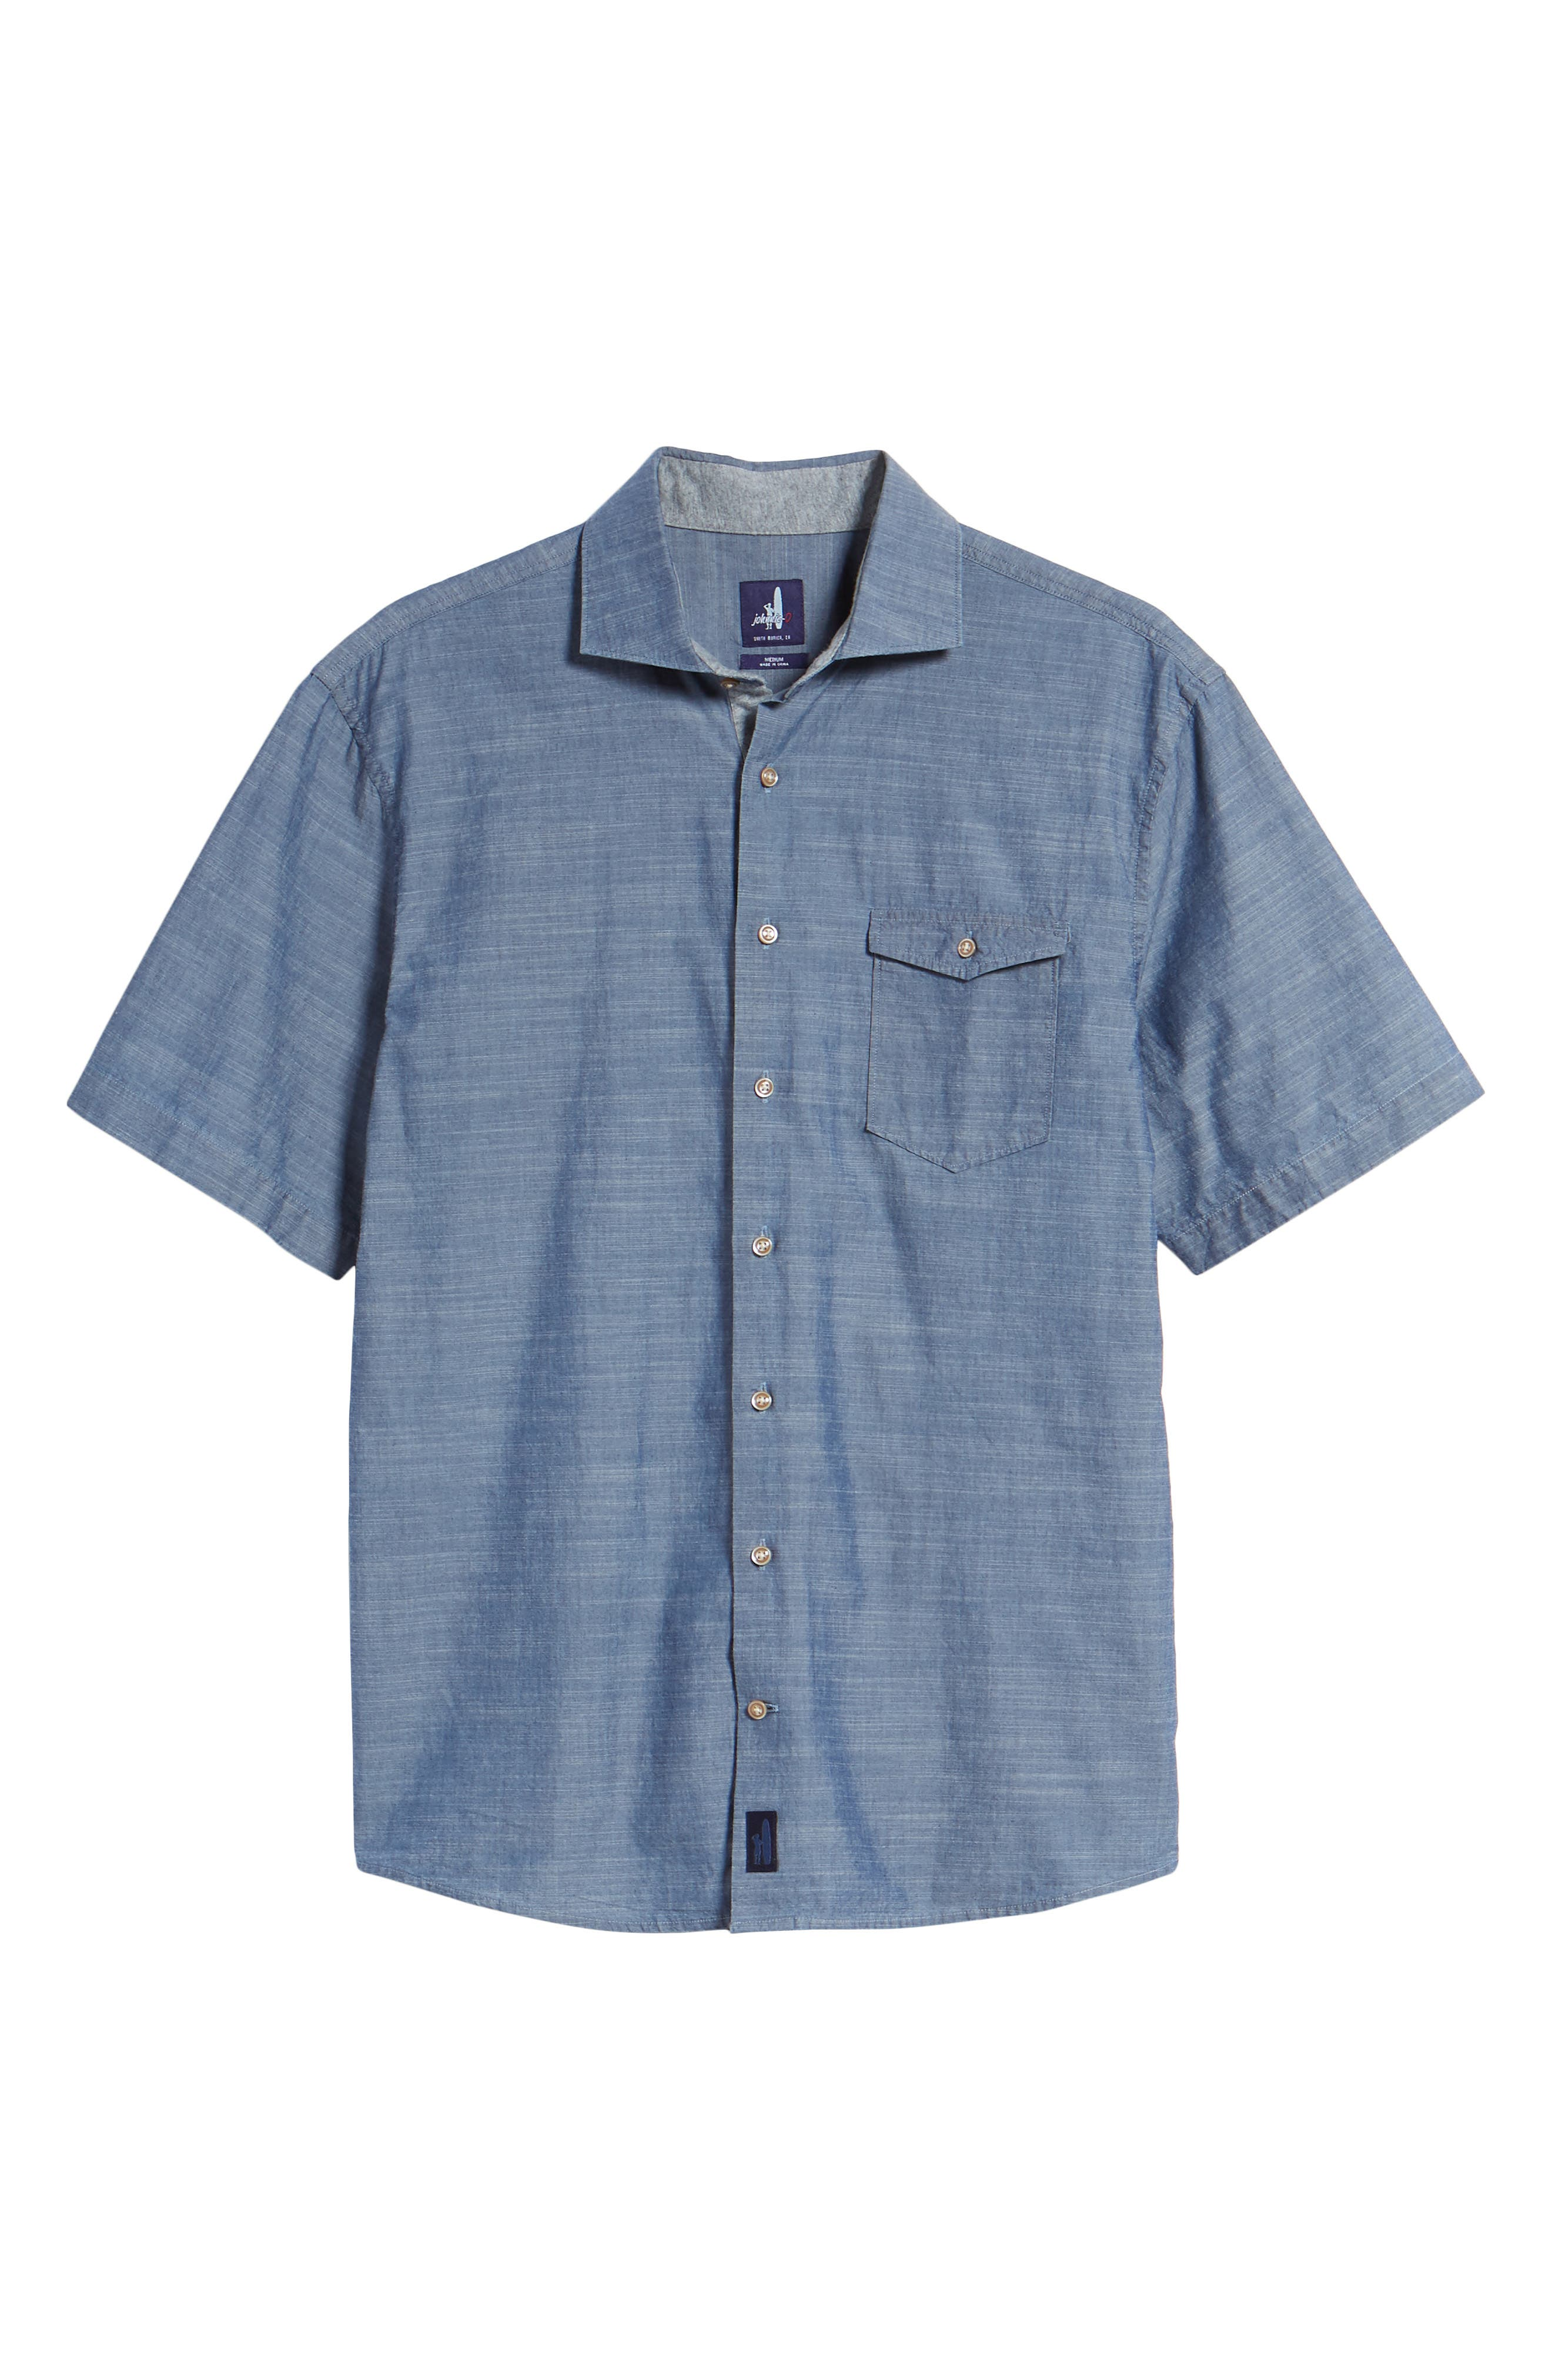 Lucas Regular Fit Chambray Sport Shirt,                             Alternate thumbnail 6, color,                             403